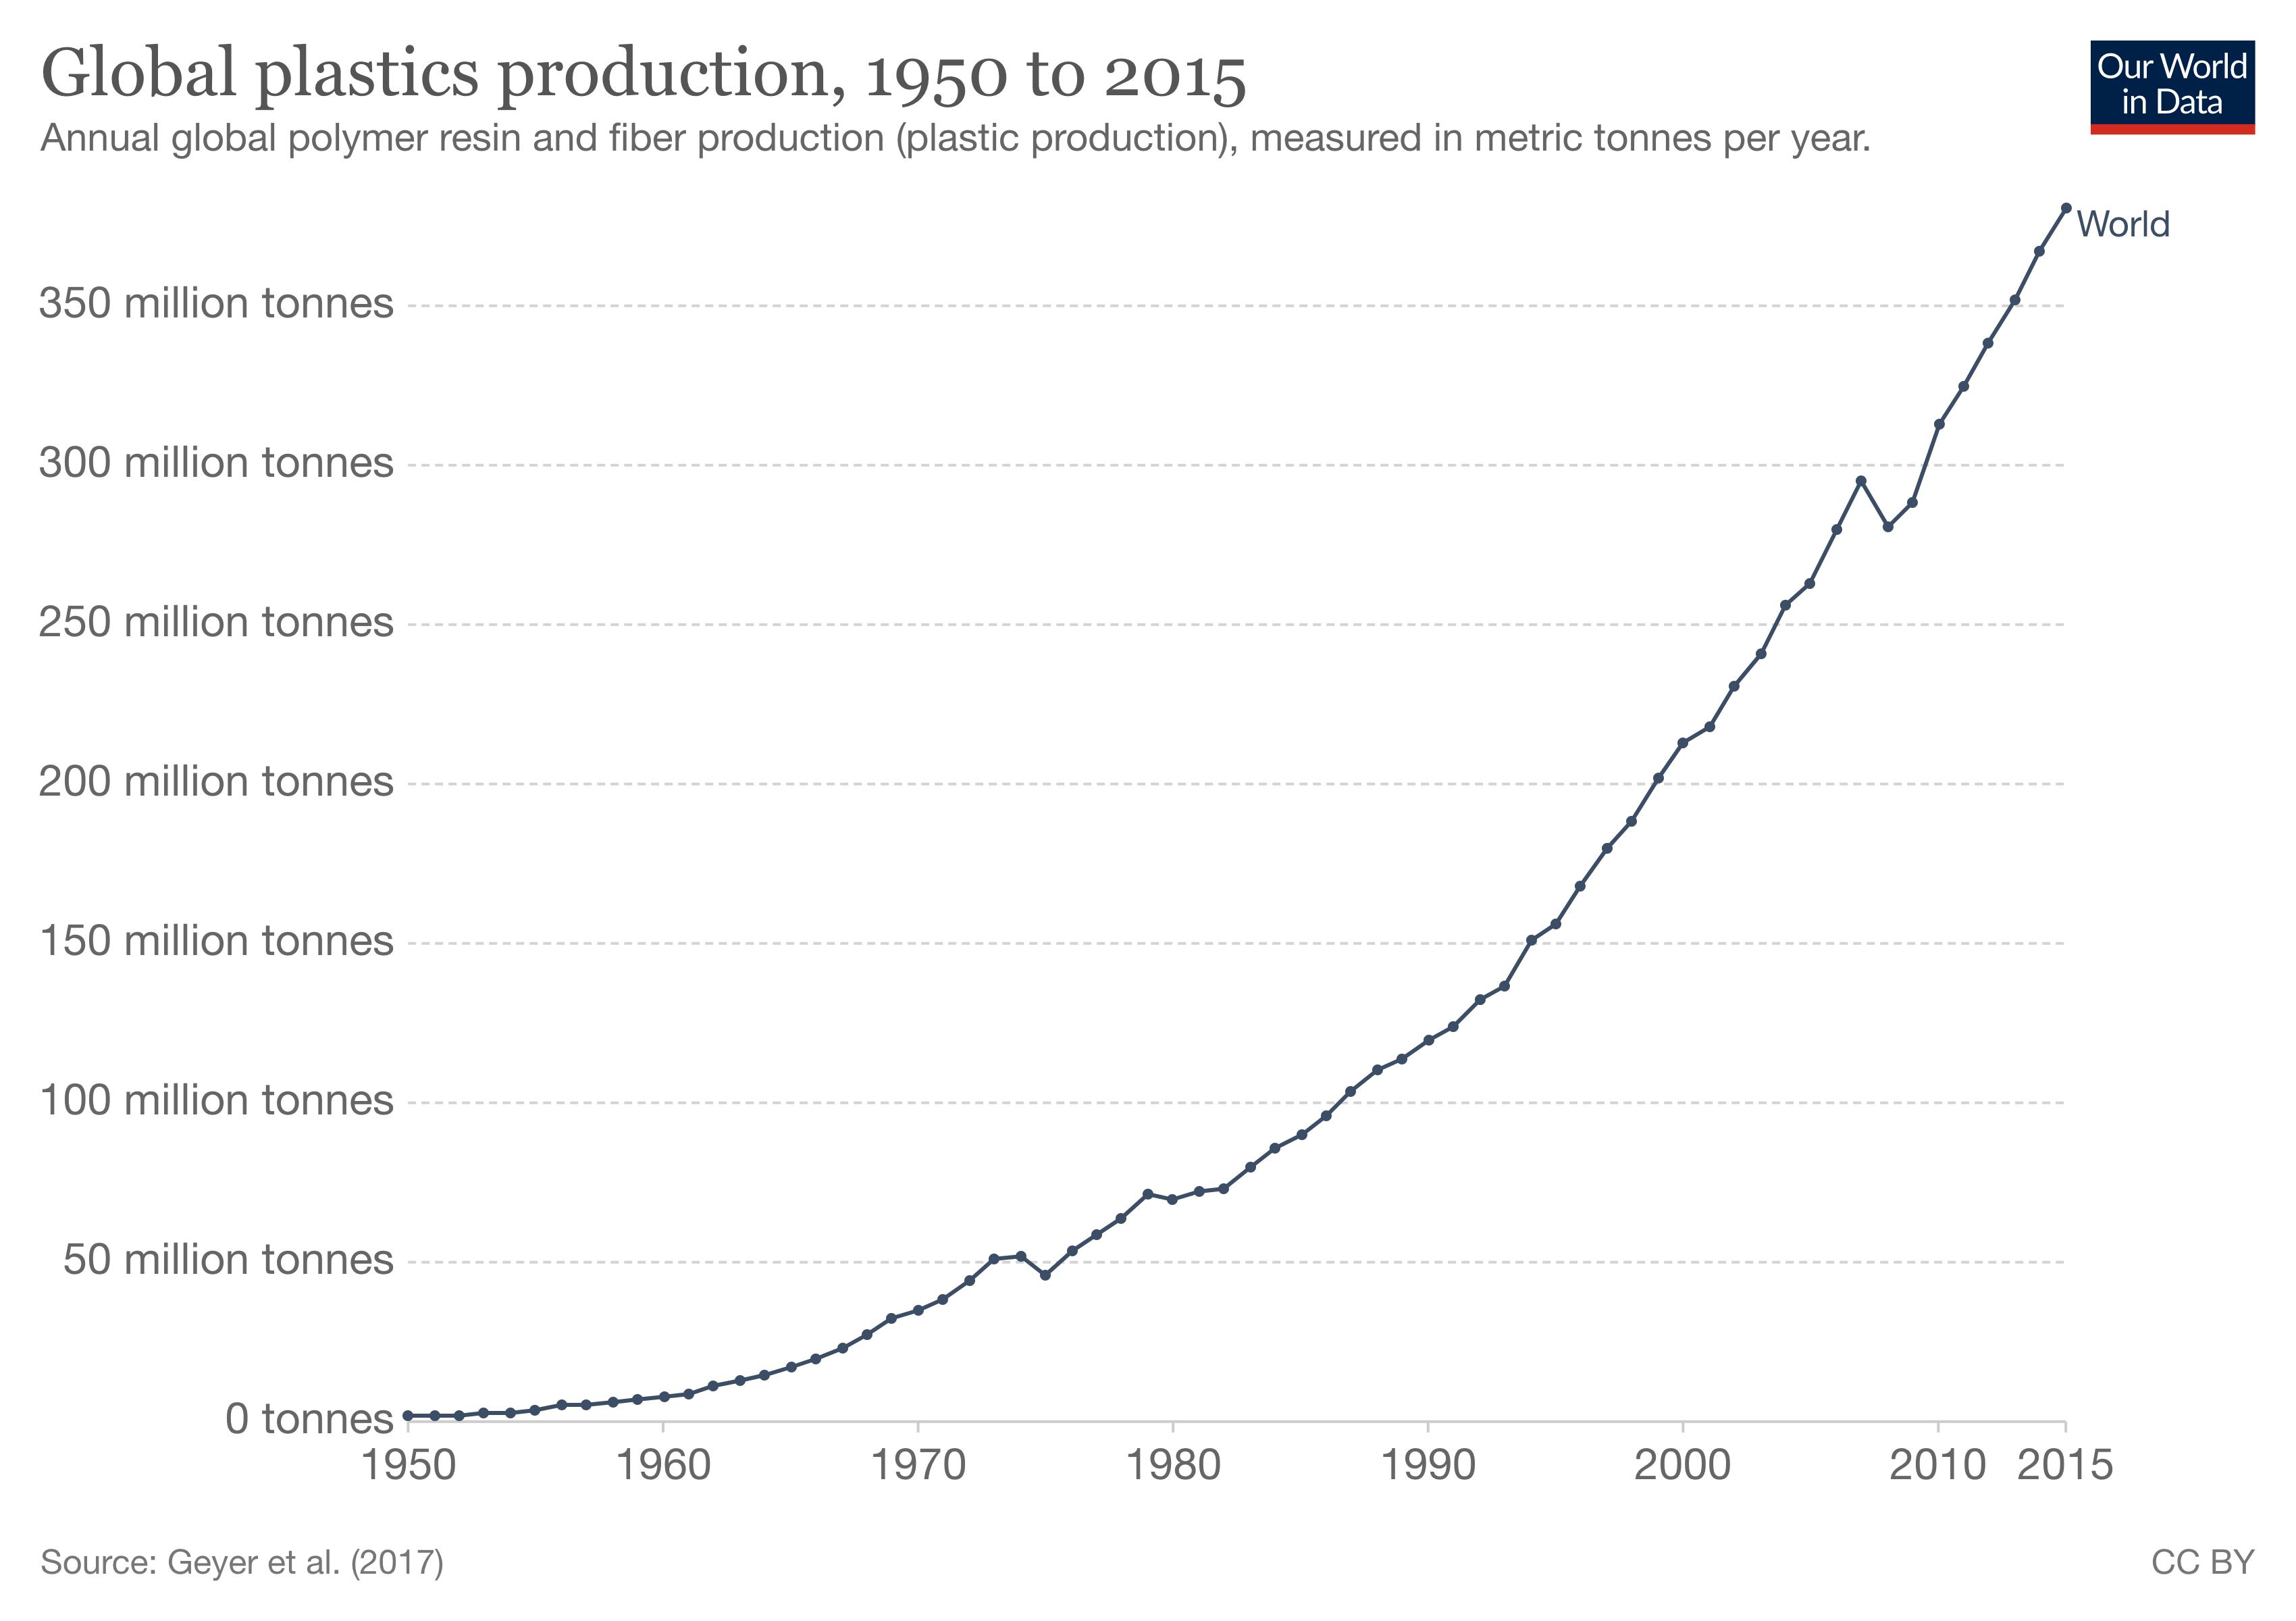 Global plastics production